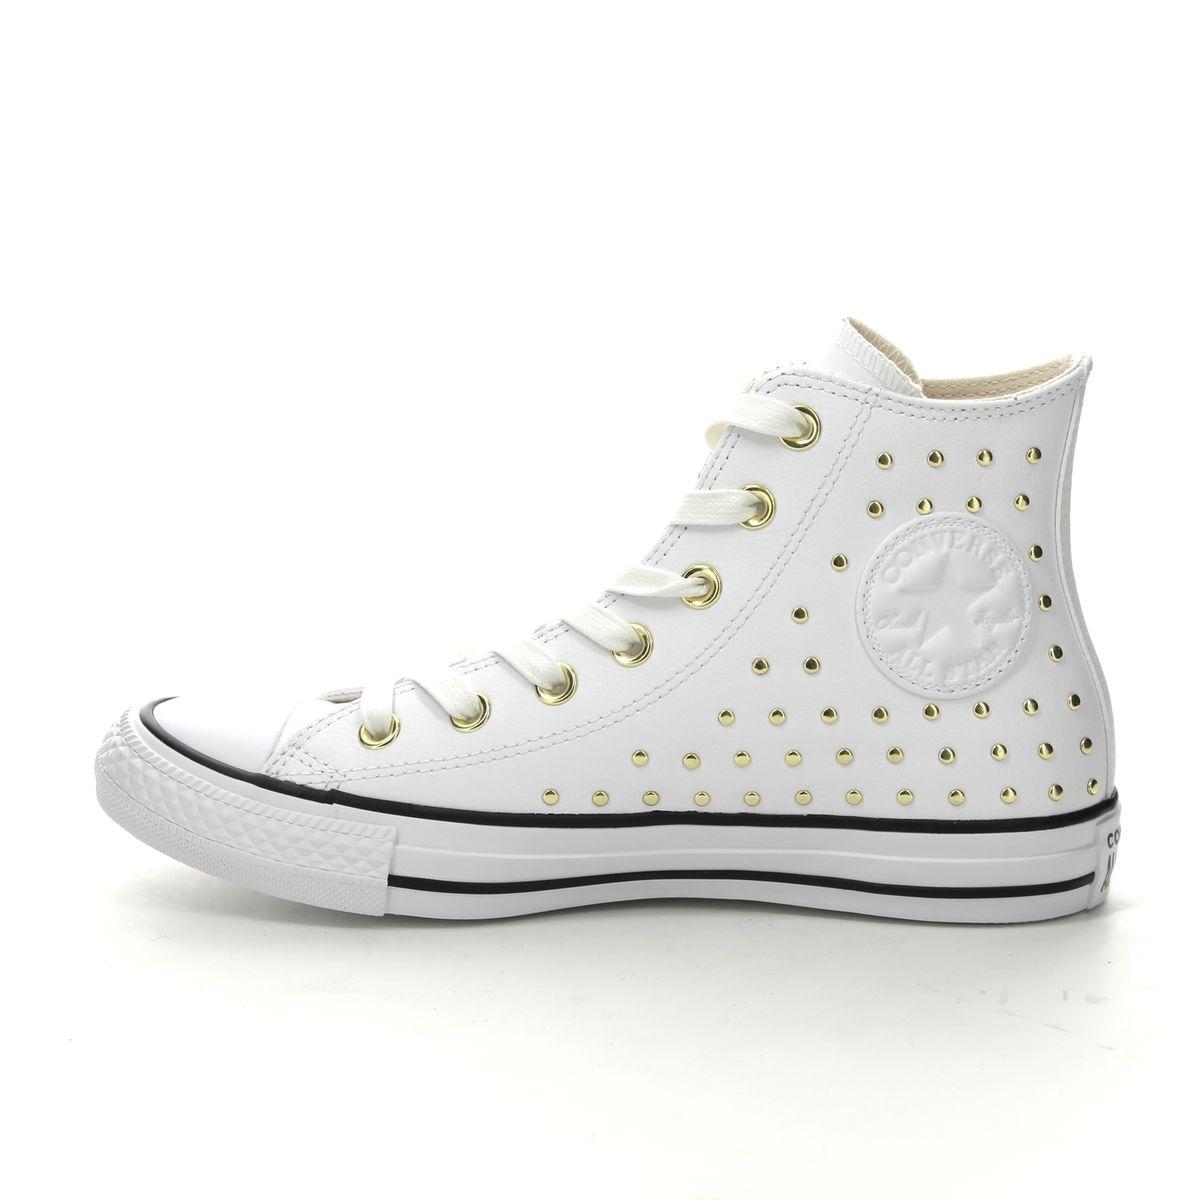 57a4a68199e Converse Trainers - White - 561683C ALLSTAR HI STUDS